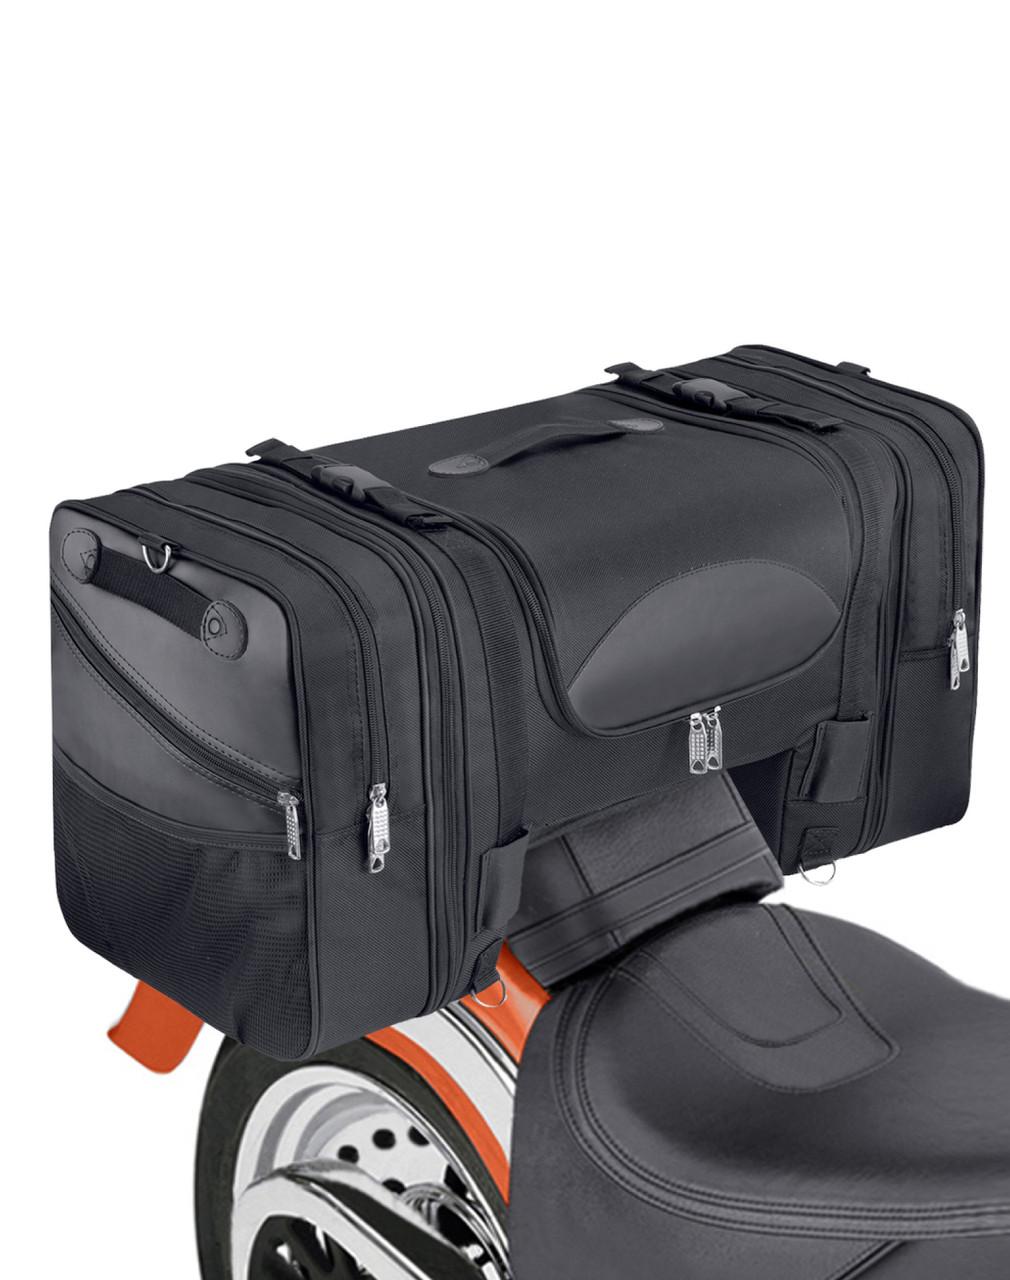 Victory Viking Expandable Cruiser Motorcycle Tail Bag